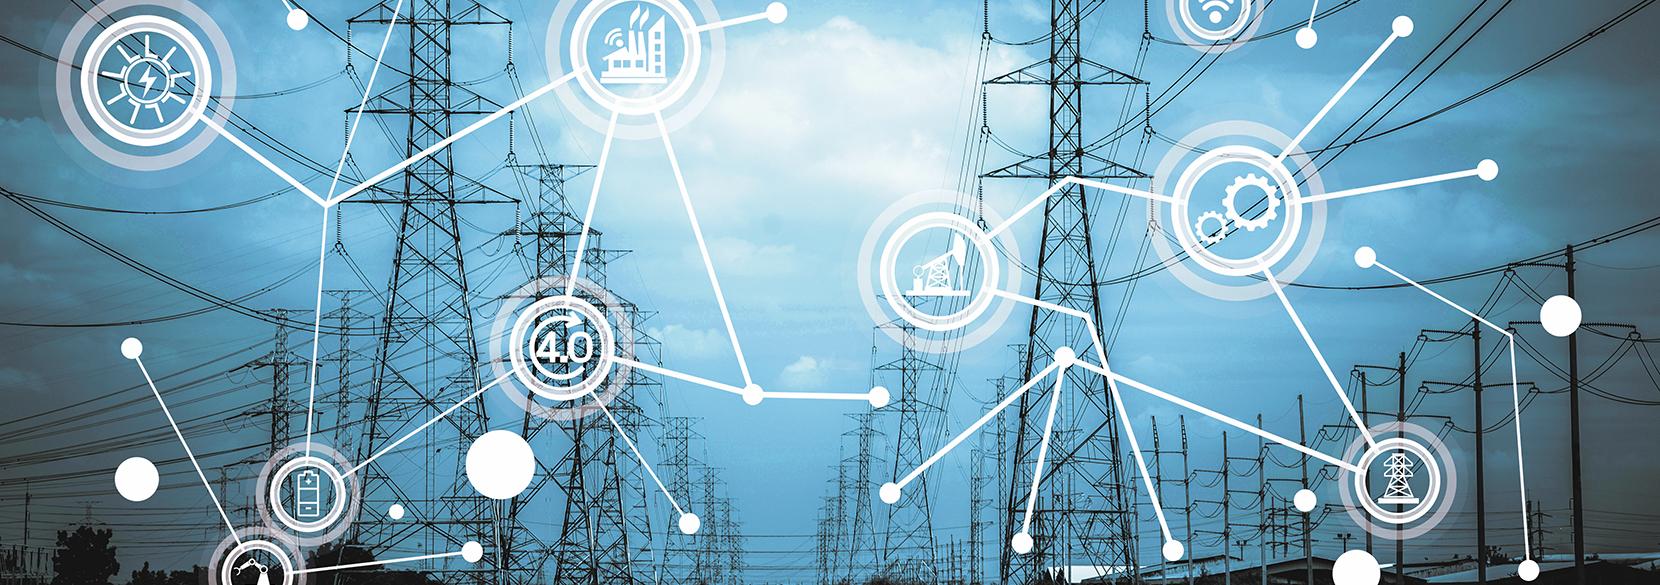 NetzImpuls – Electrosuisse